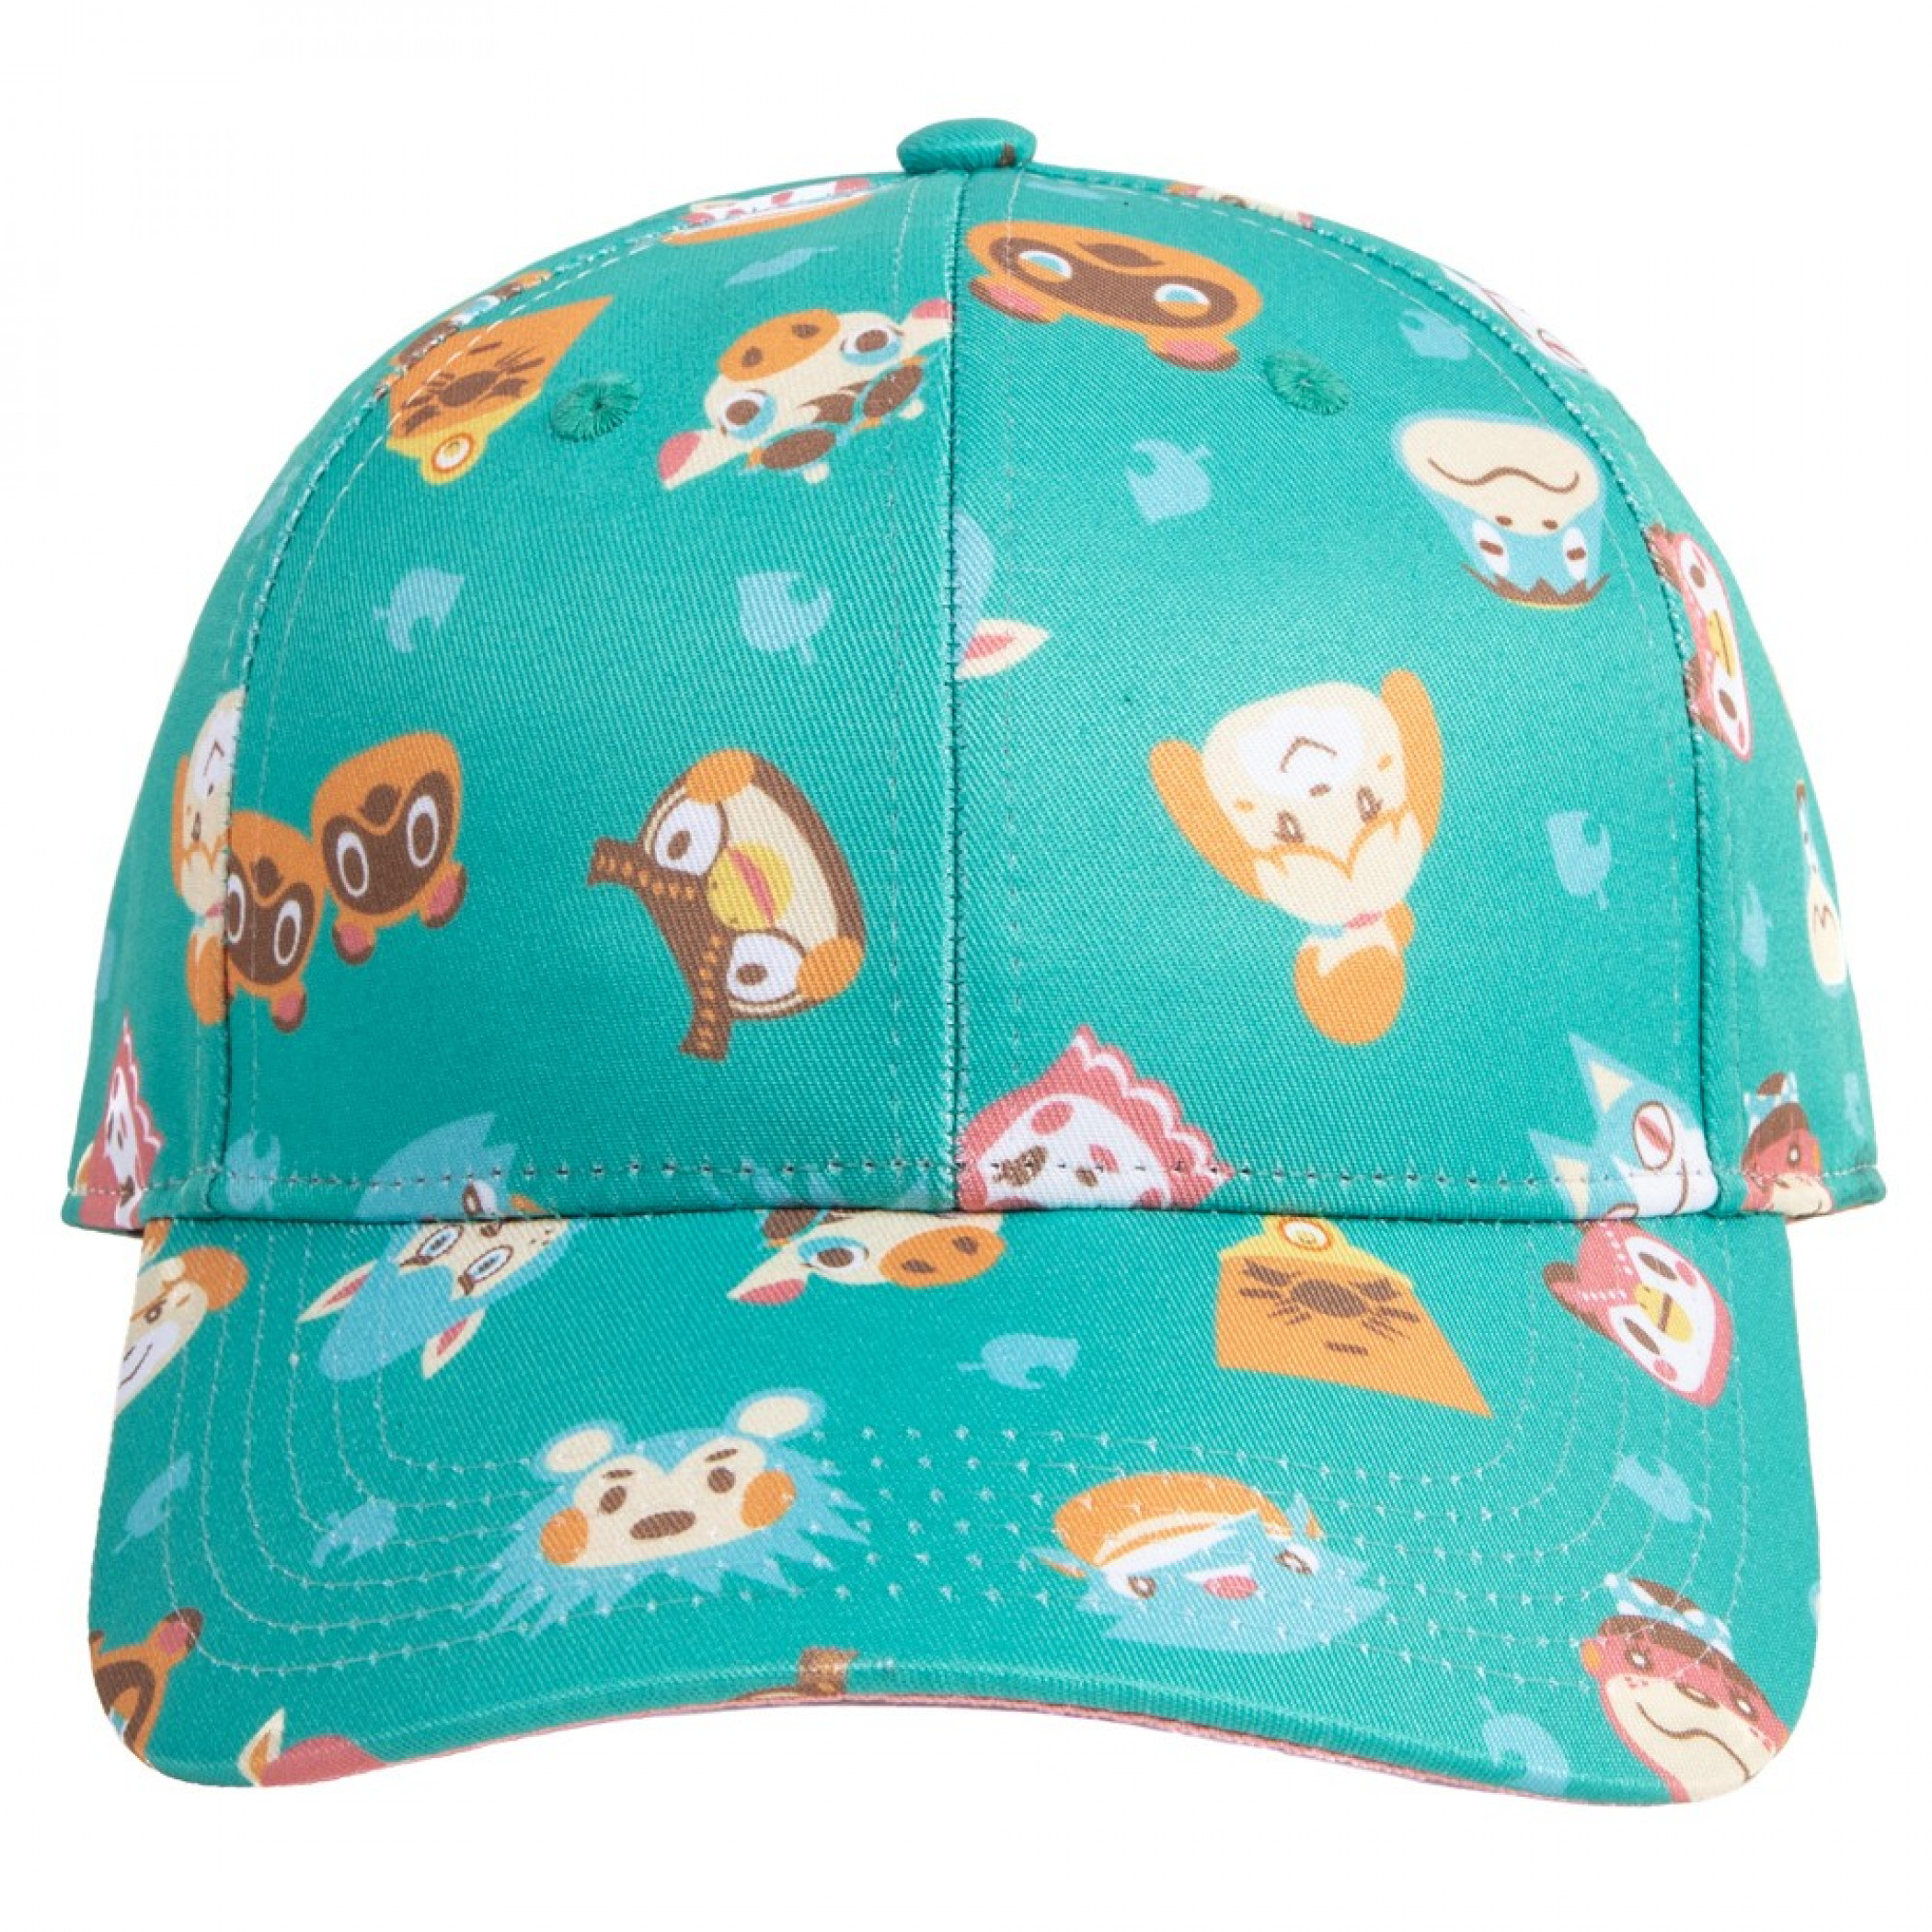 Animal Crossing All Over Print Adjustable Strapback Hat